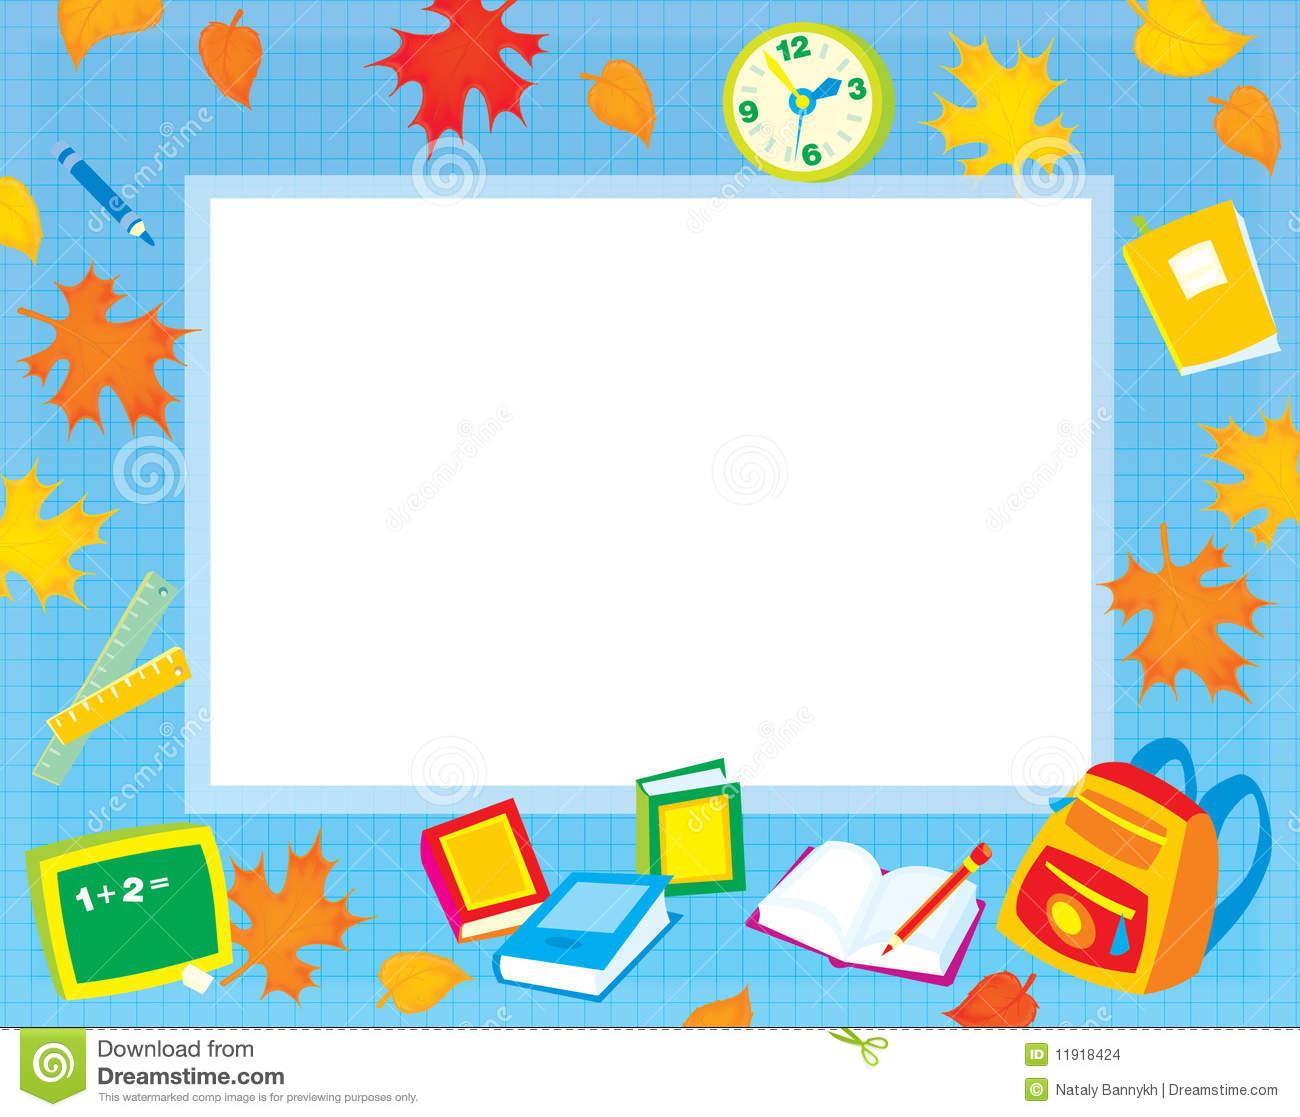 Boarder clipart education. Elementary border